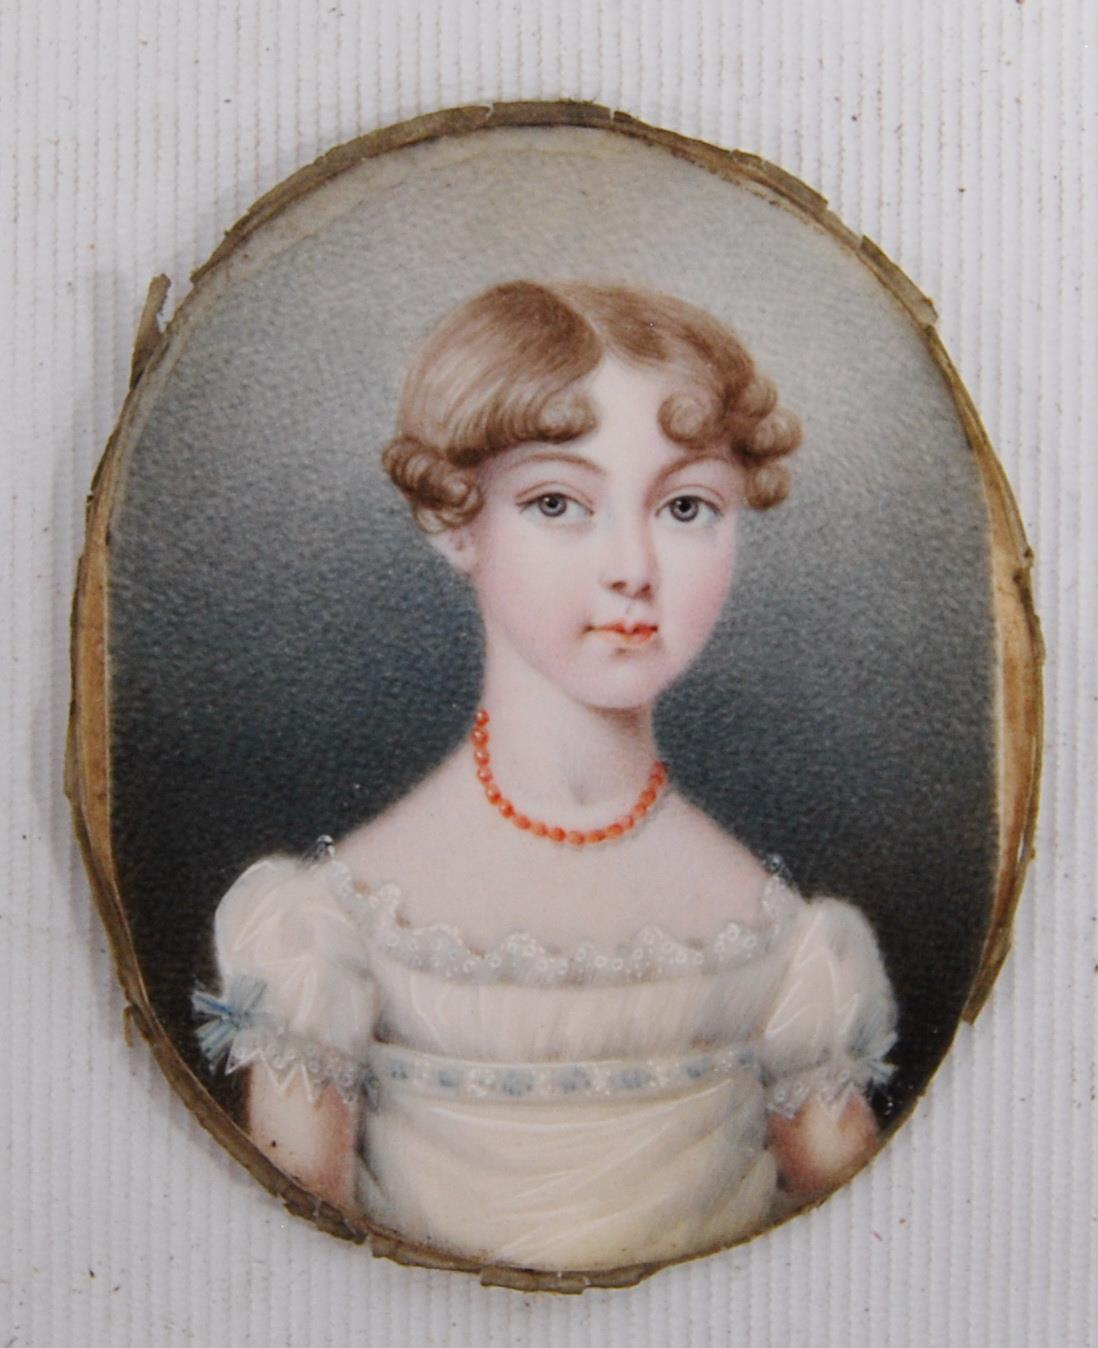 JC Browning (c. 1824) 19th century portrait - Image 2 of 3